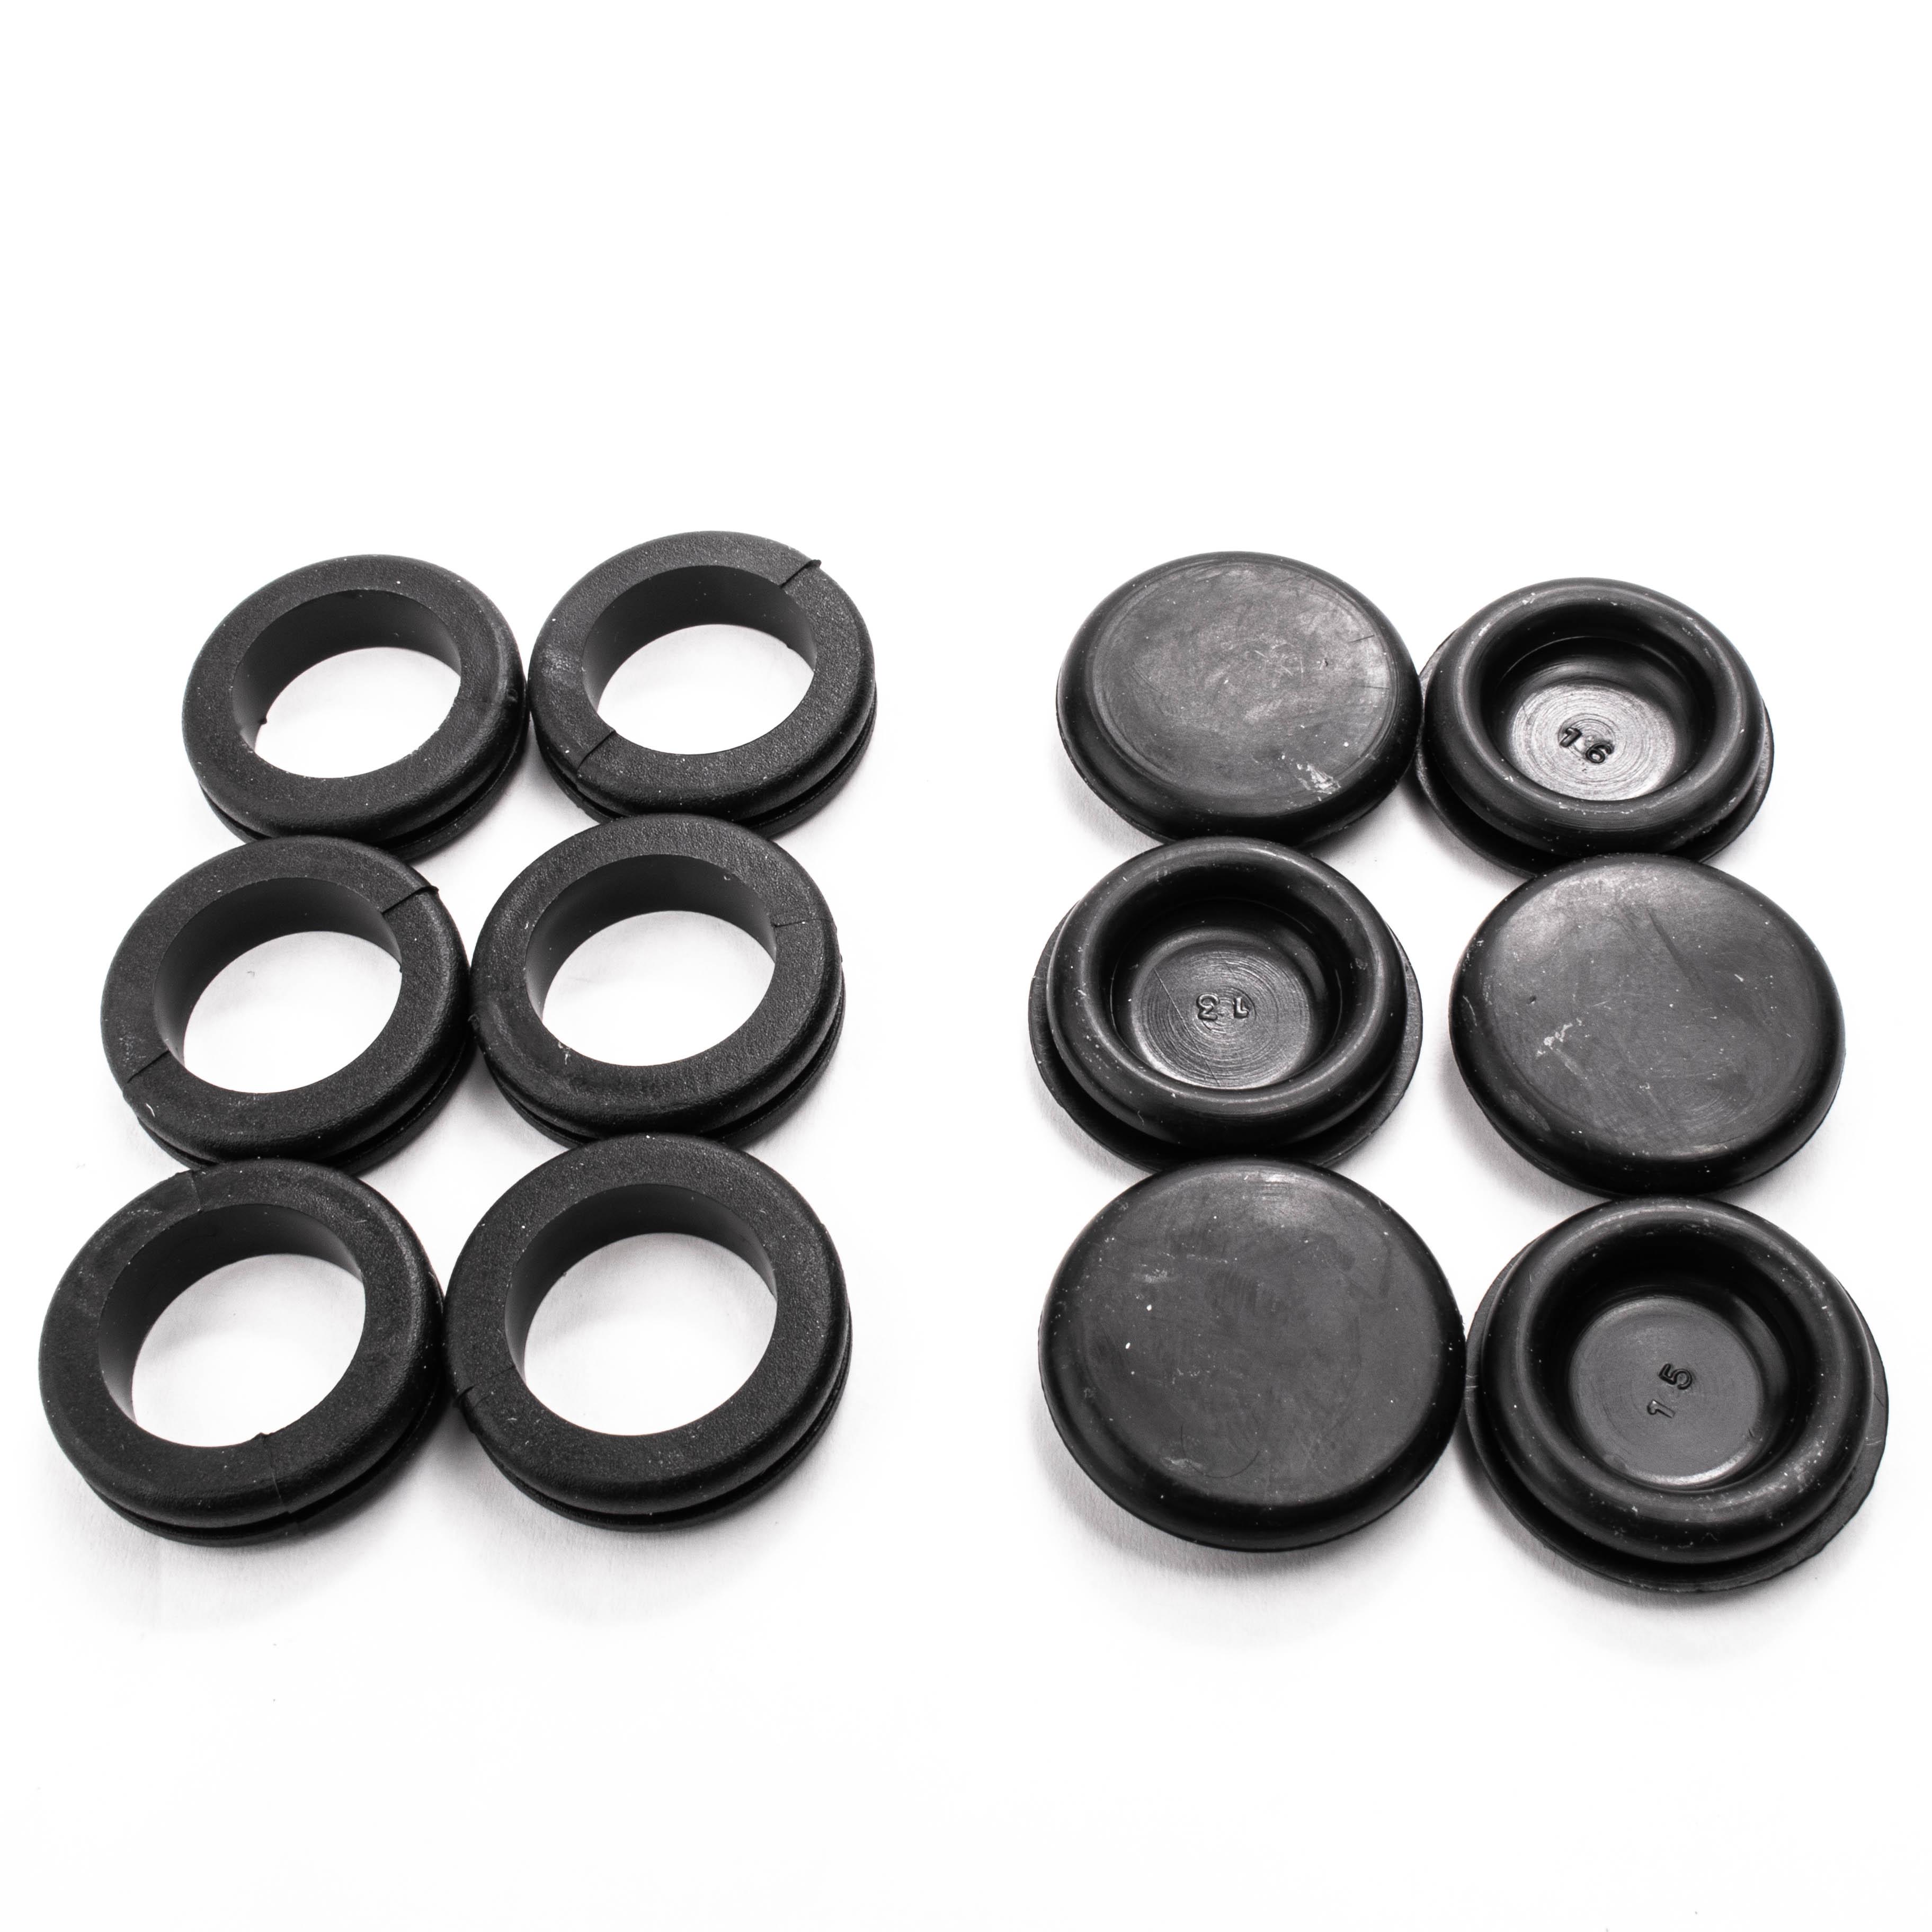 20 Schneider Electric 20mm PVC Grommets for mains metal back box grommet